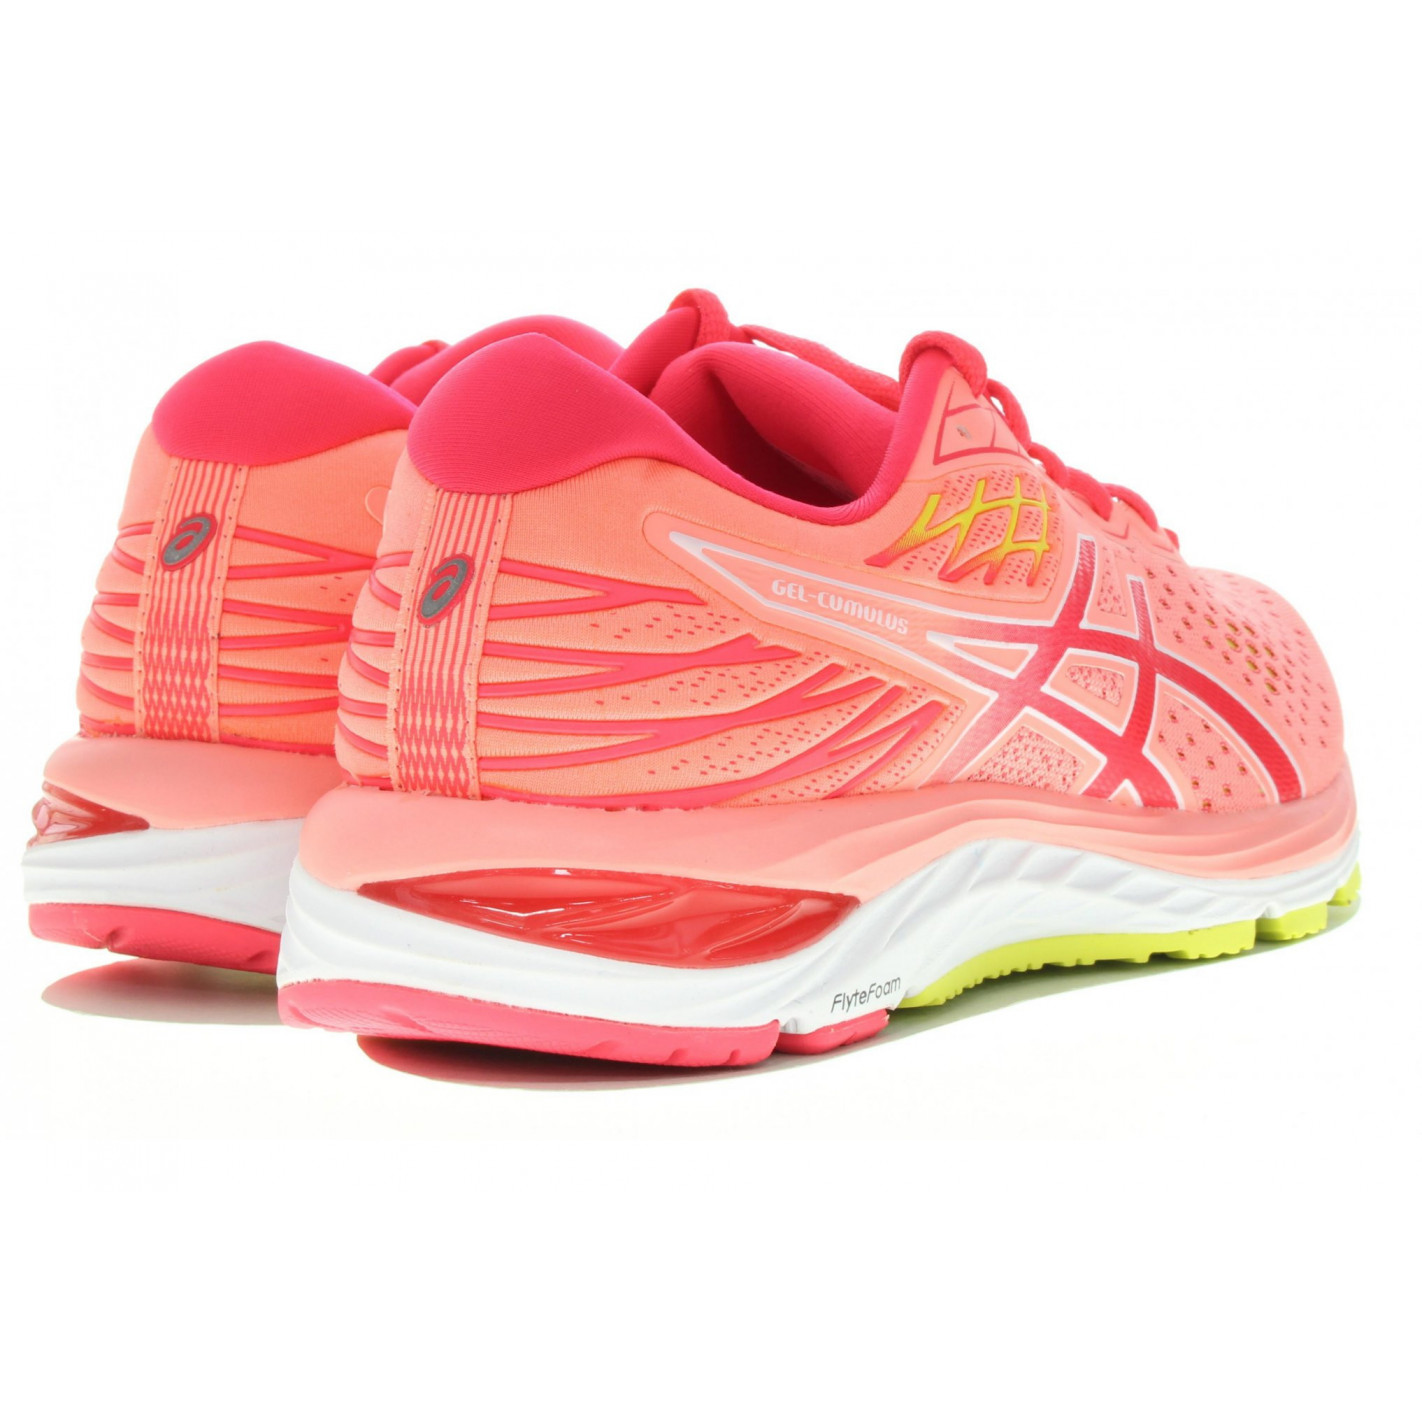 Chaussures Running ASICS Femme GEL-CUMULUS 21 SHINE Corail/Rose ...